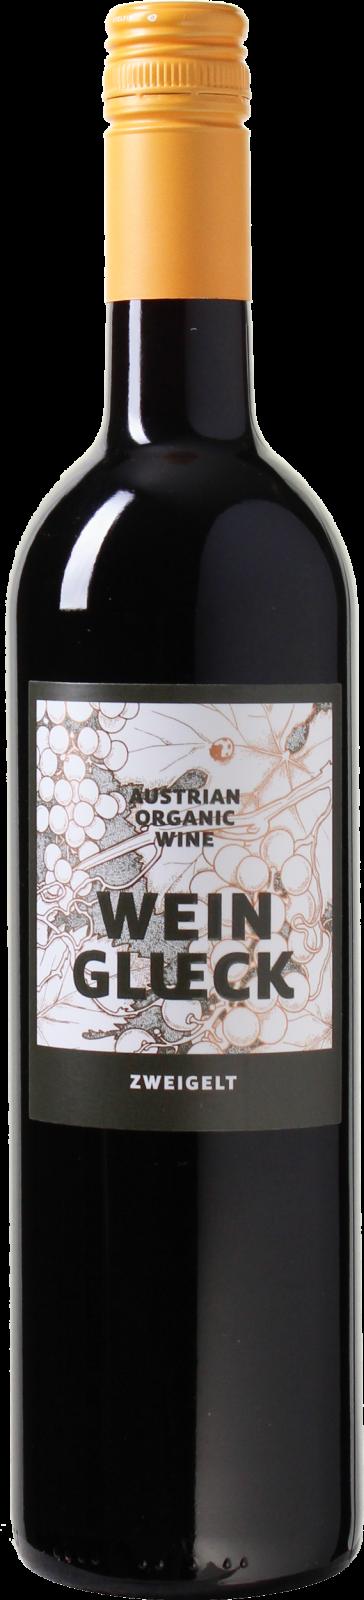 Weinglueck Zweigelt (Organic)